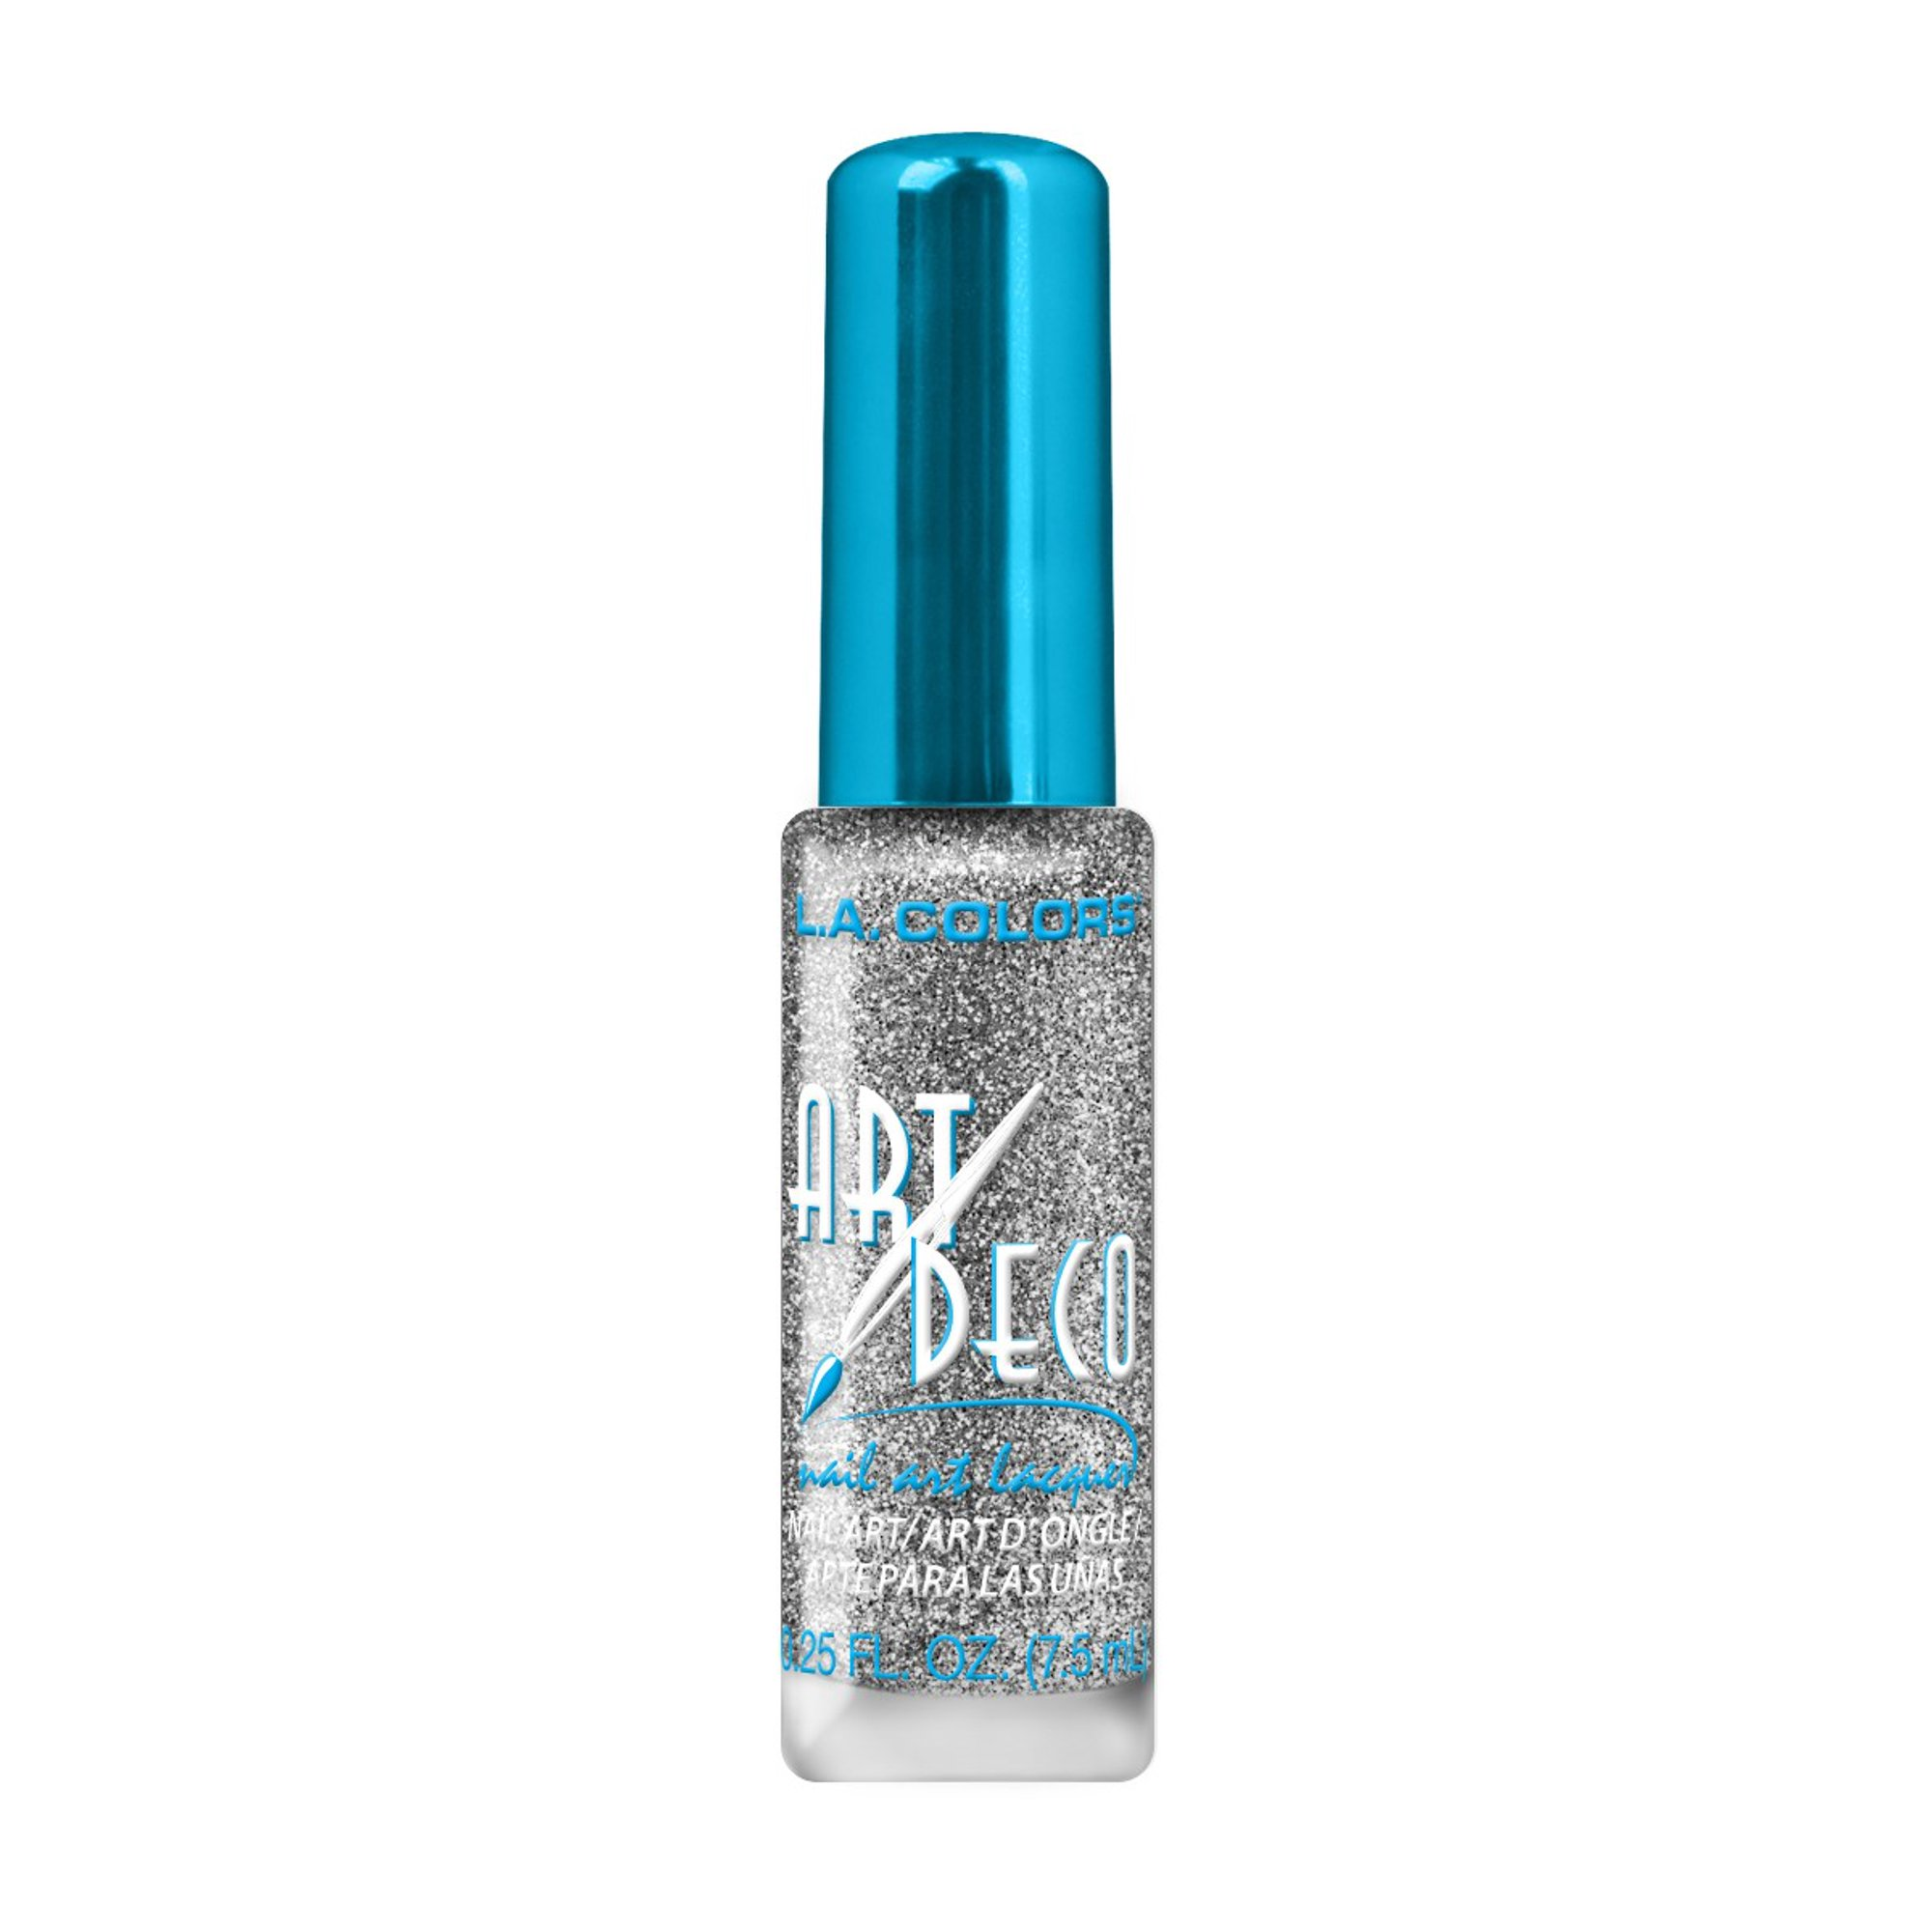 Buy LA Colors Art Deco Nail Art Polish, Silver Glitter, 0.25 Oz ...